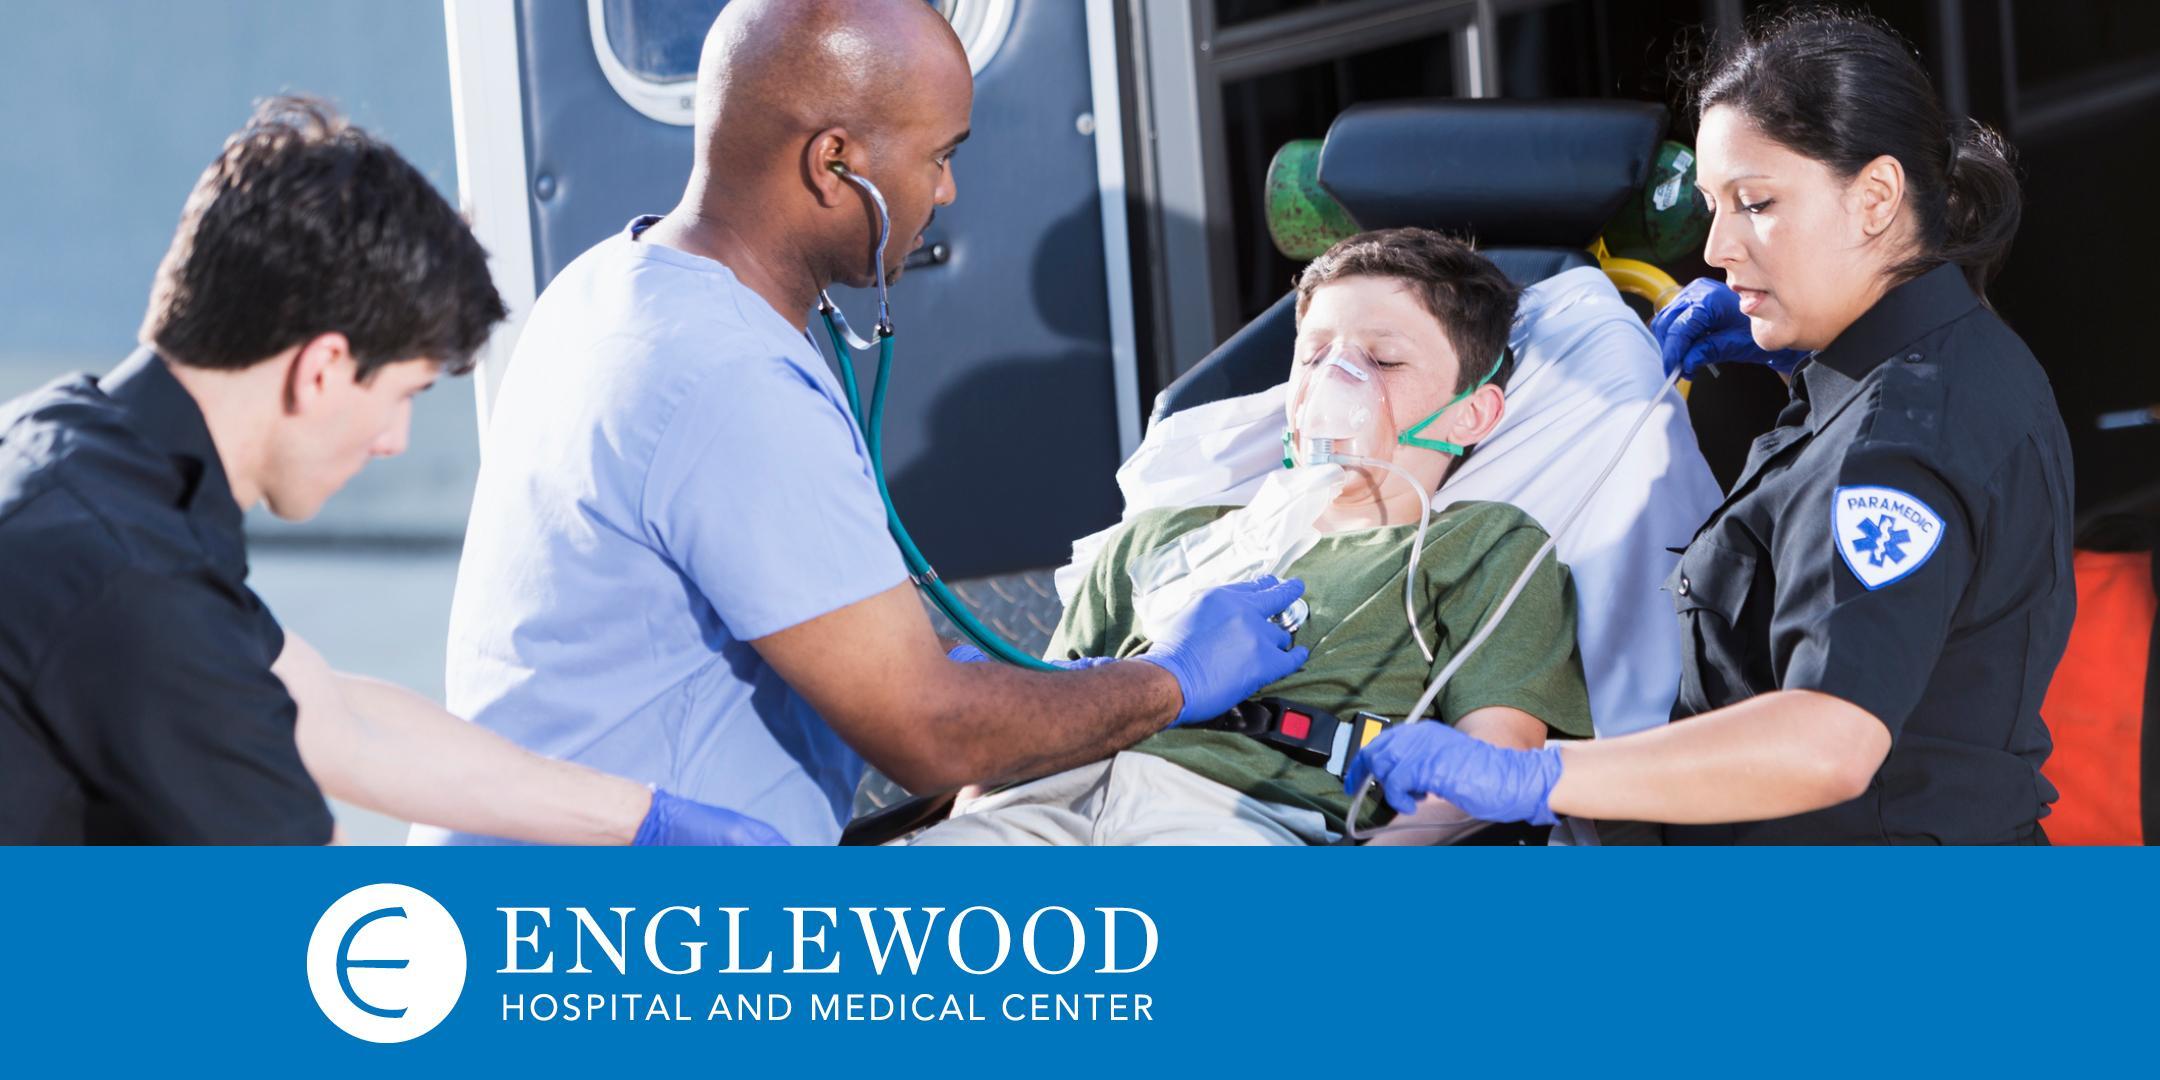 More info: Pediatric Advanced Life Support Course - Renewal Course